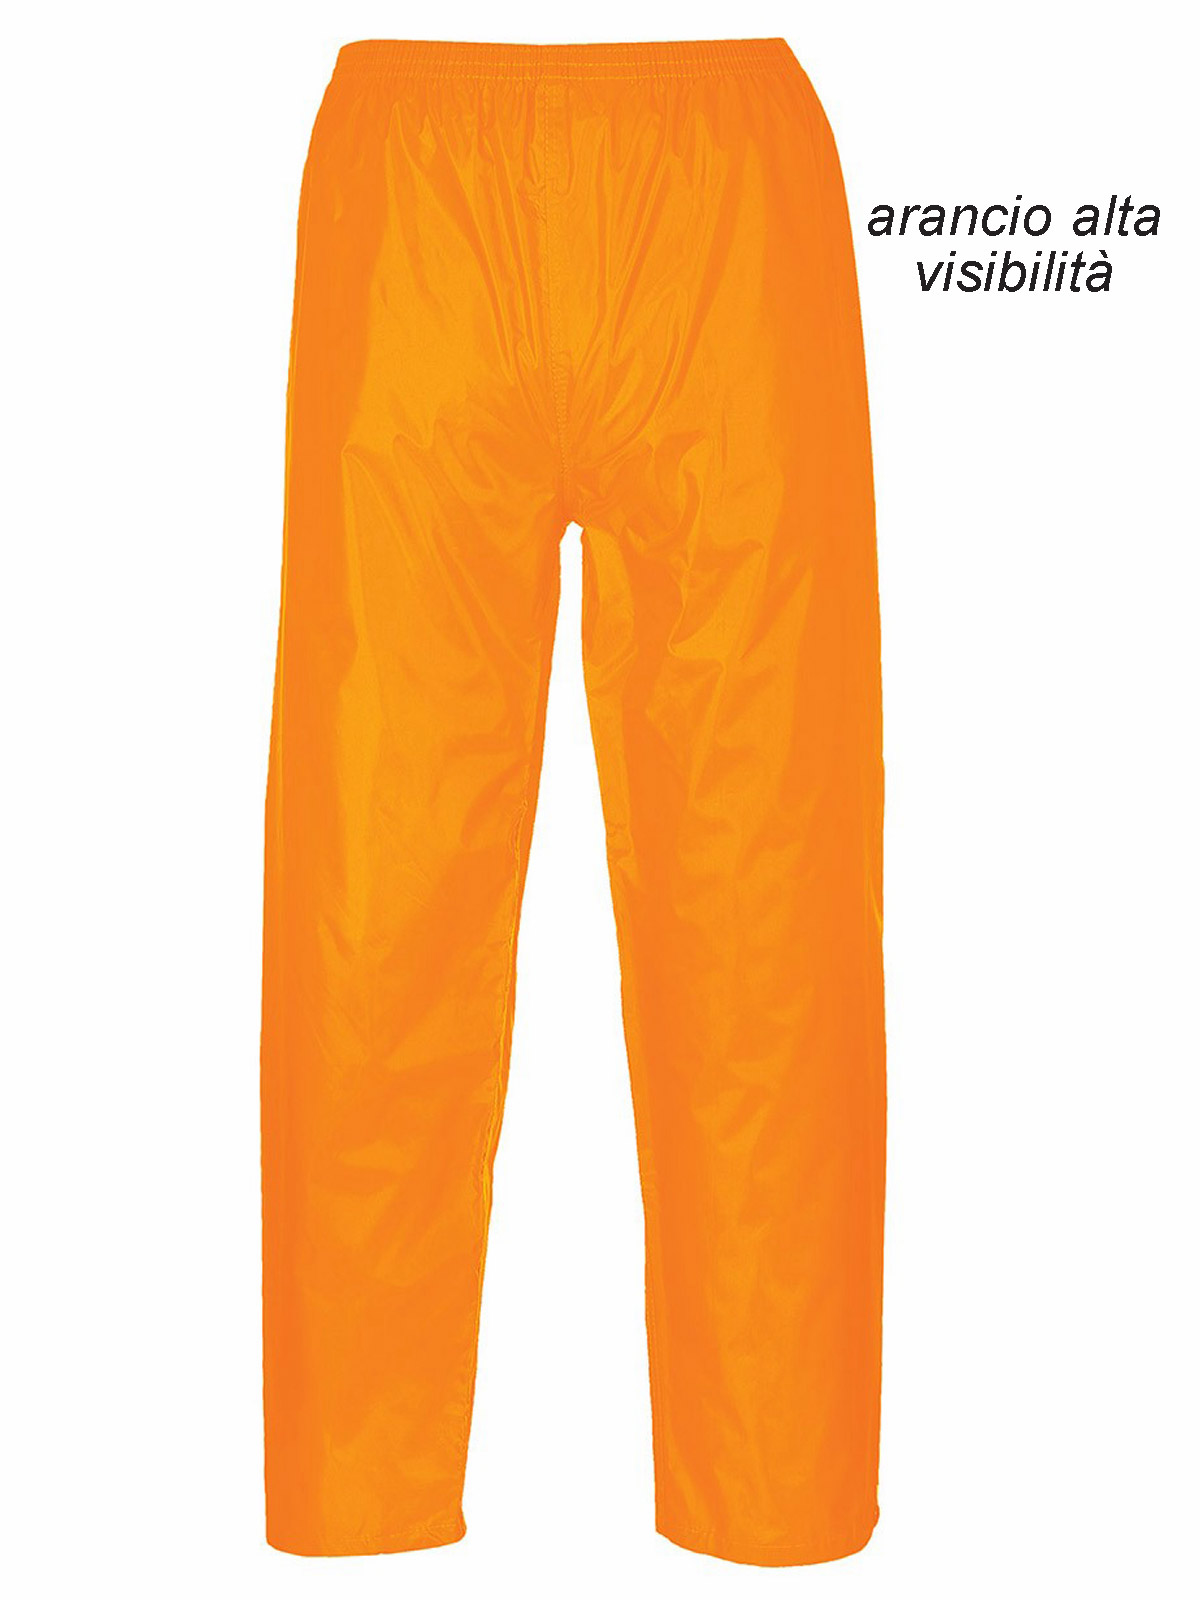 Nero Colore Portwest Pantaloni Impermeabili